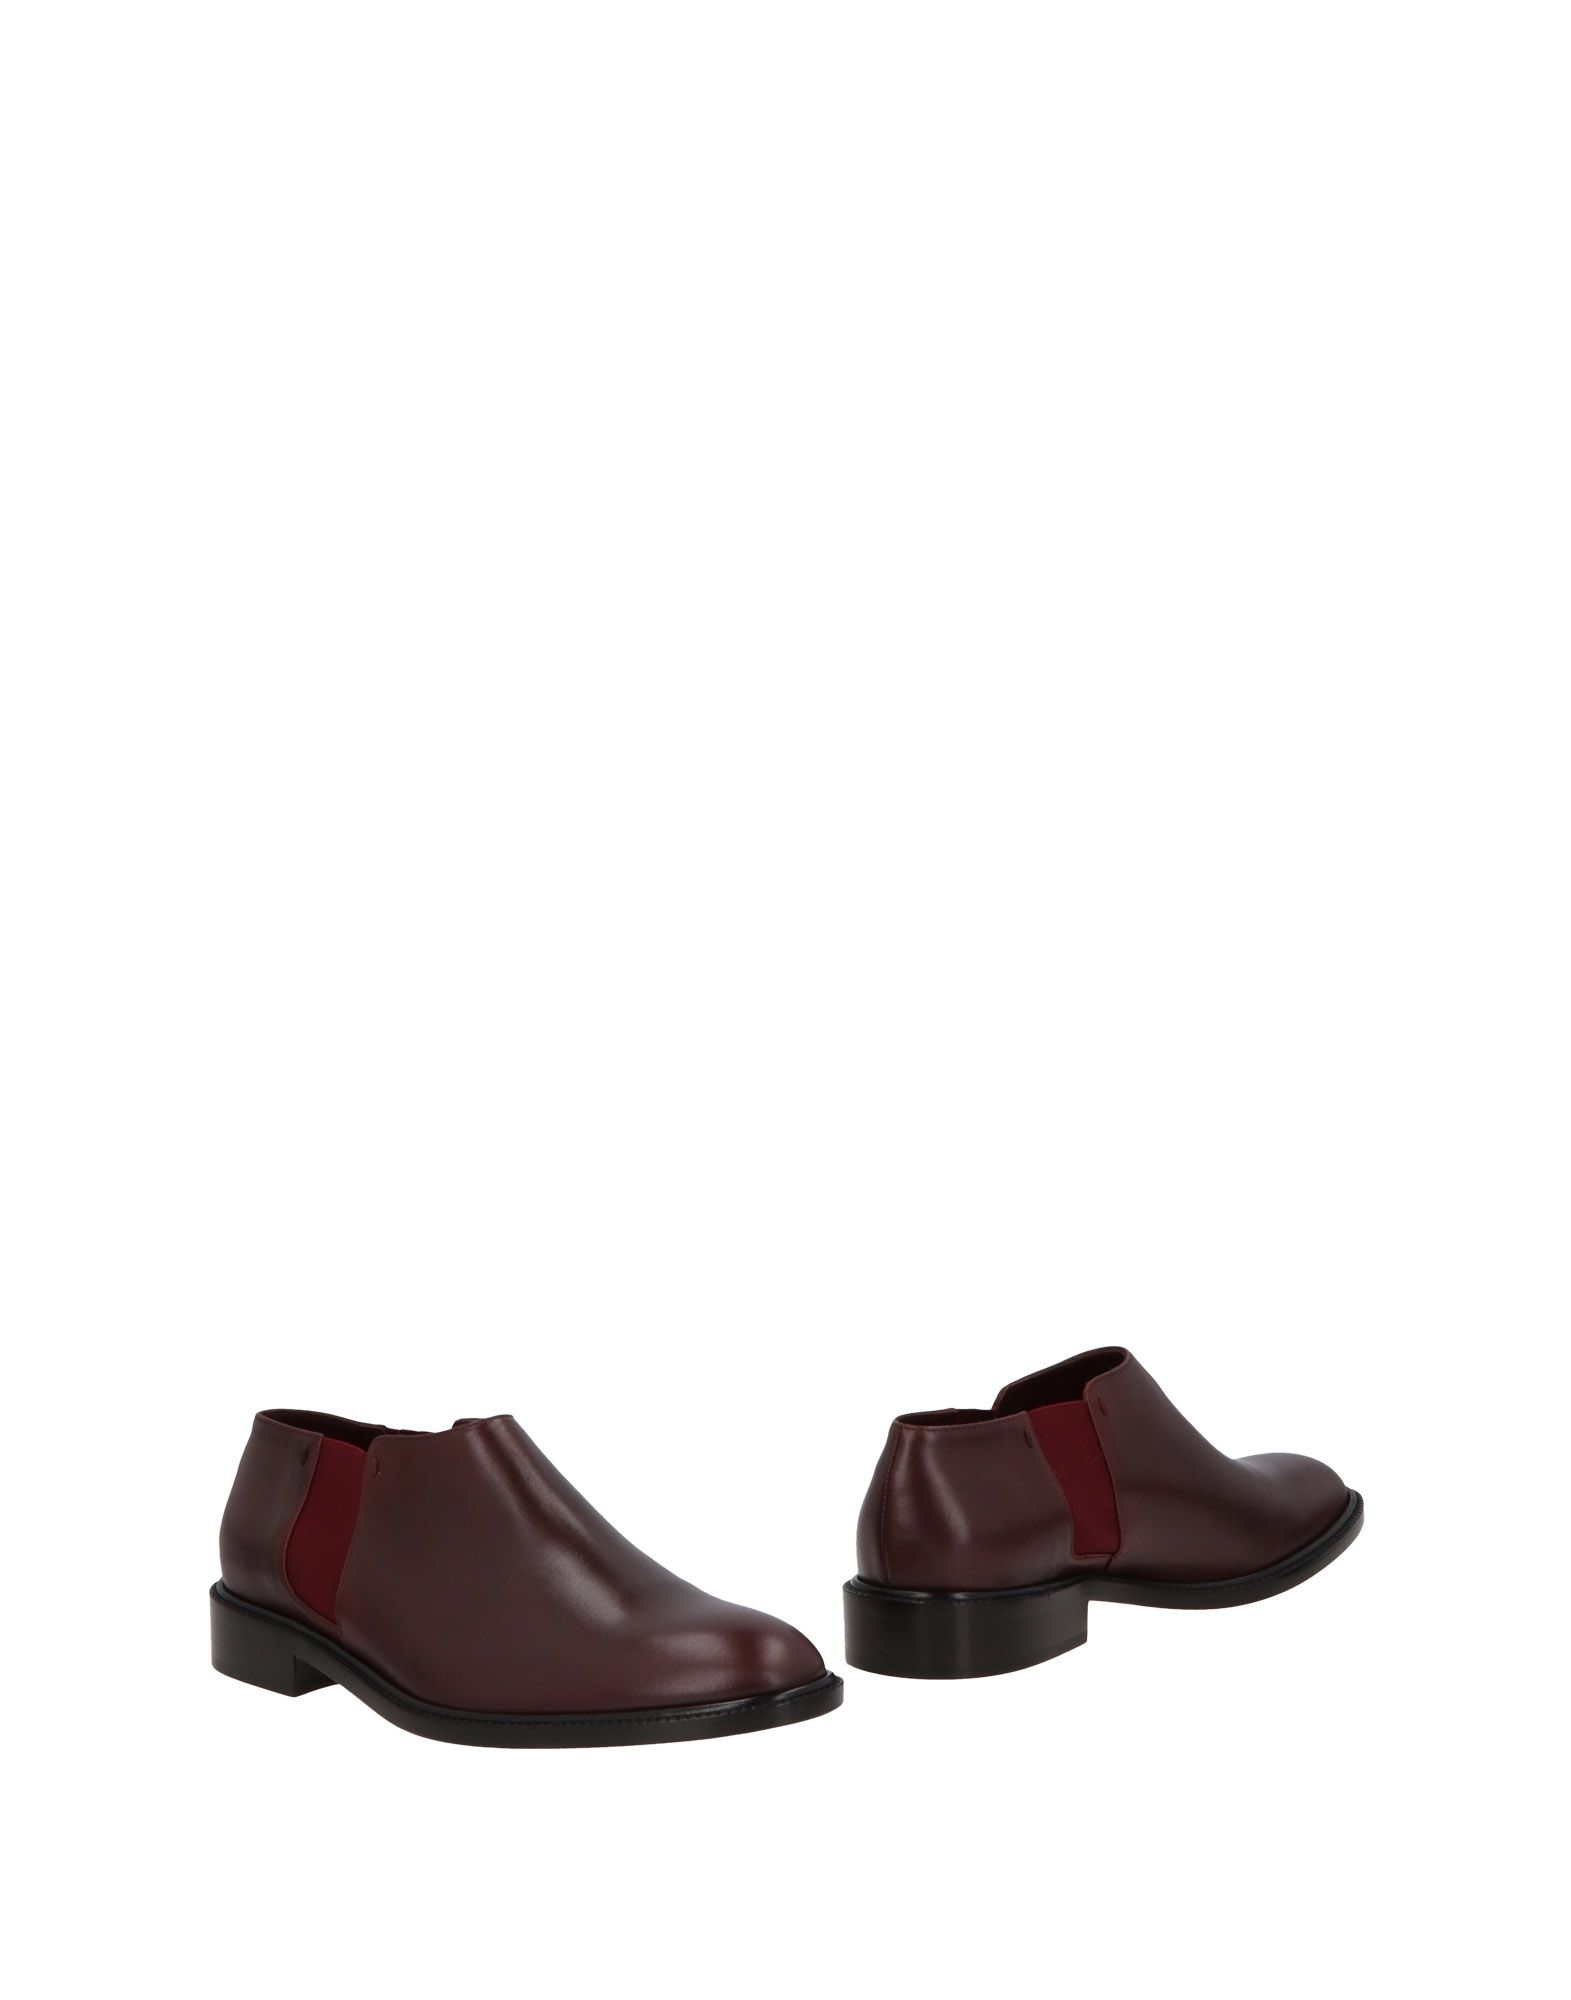 La Corte Della Pelle By Franco Ballin Stiefelette Damen  11479231NL Gute Qualität beliebte Schuhe